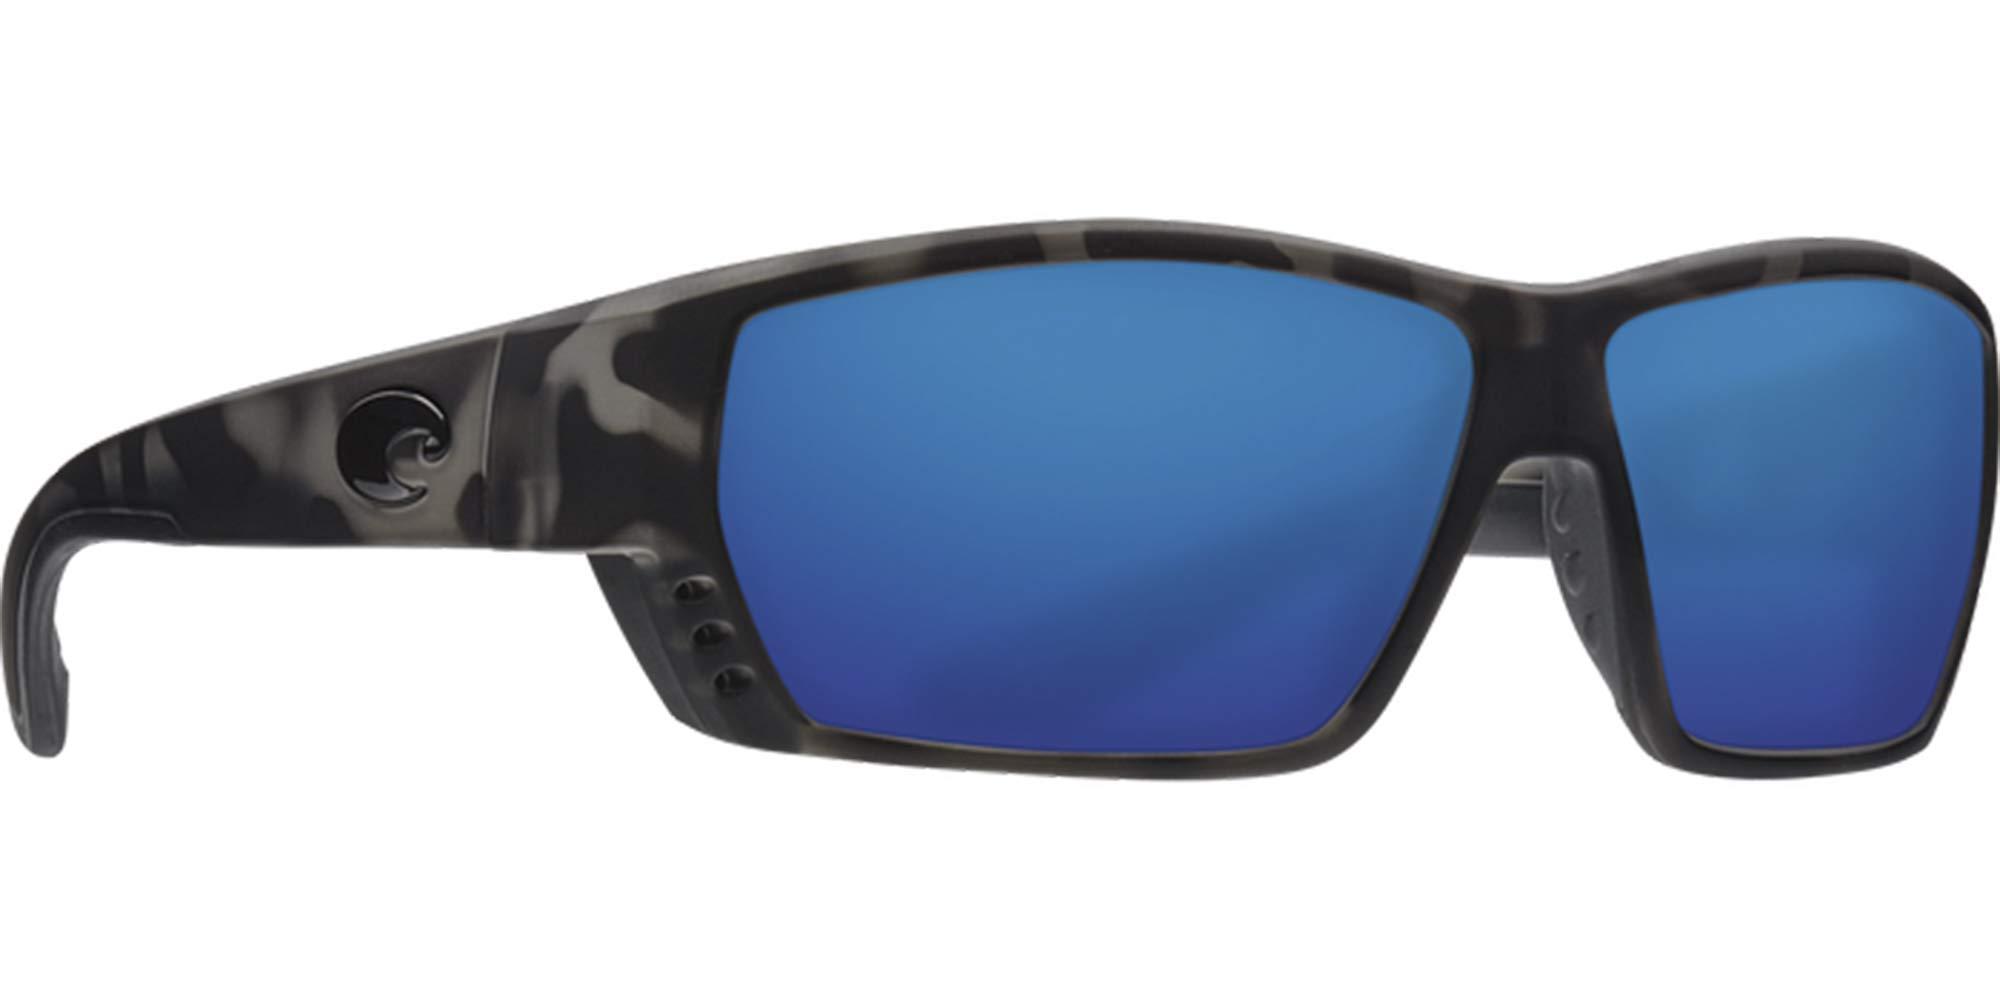 Costa Del Mar Ocearch Tuna Alley 580G Sunglasses- Tiger Shark/Blue Mirror by Costa Del Mar